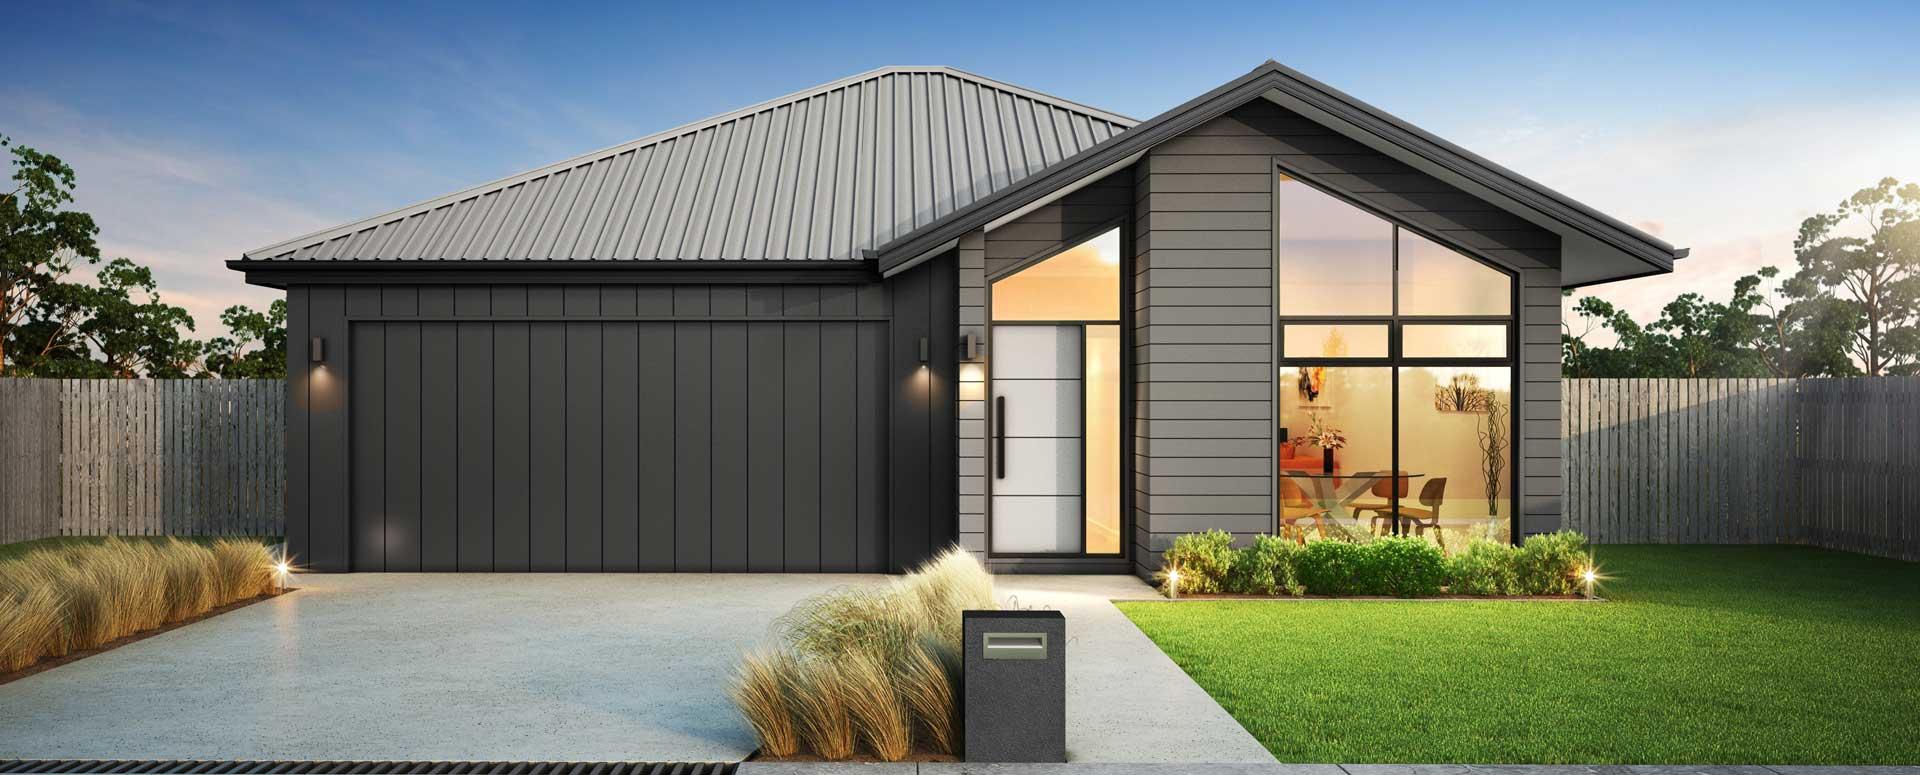 Yarra Penny Homes Banner Image